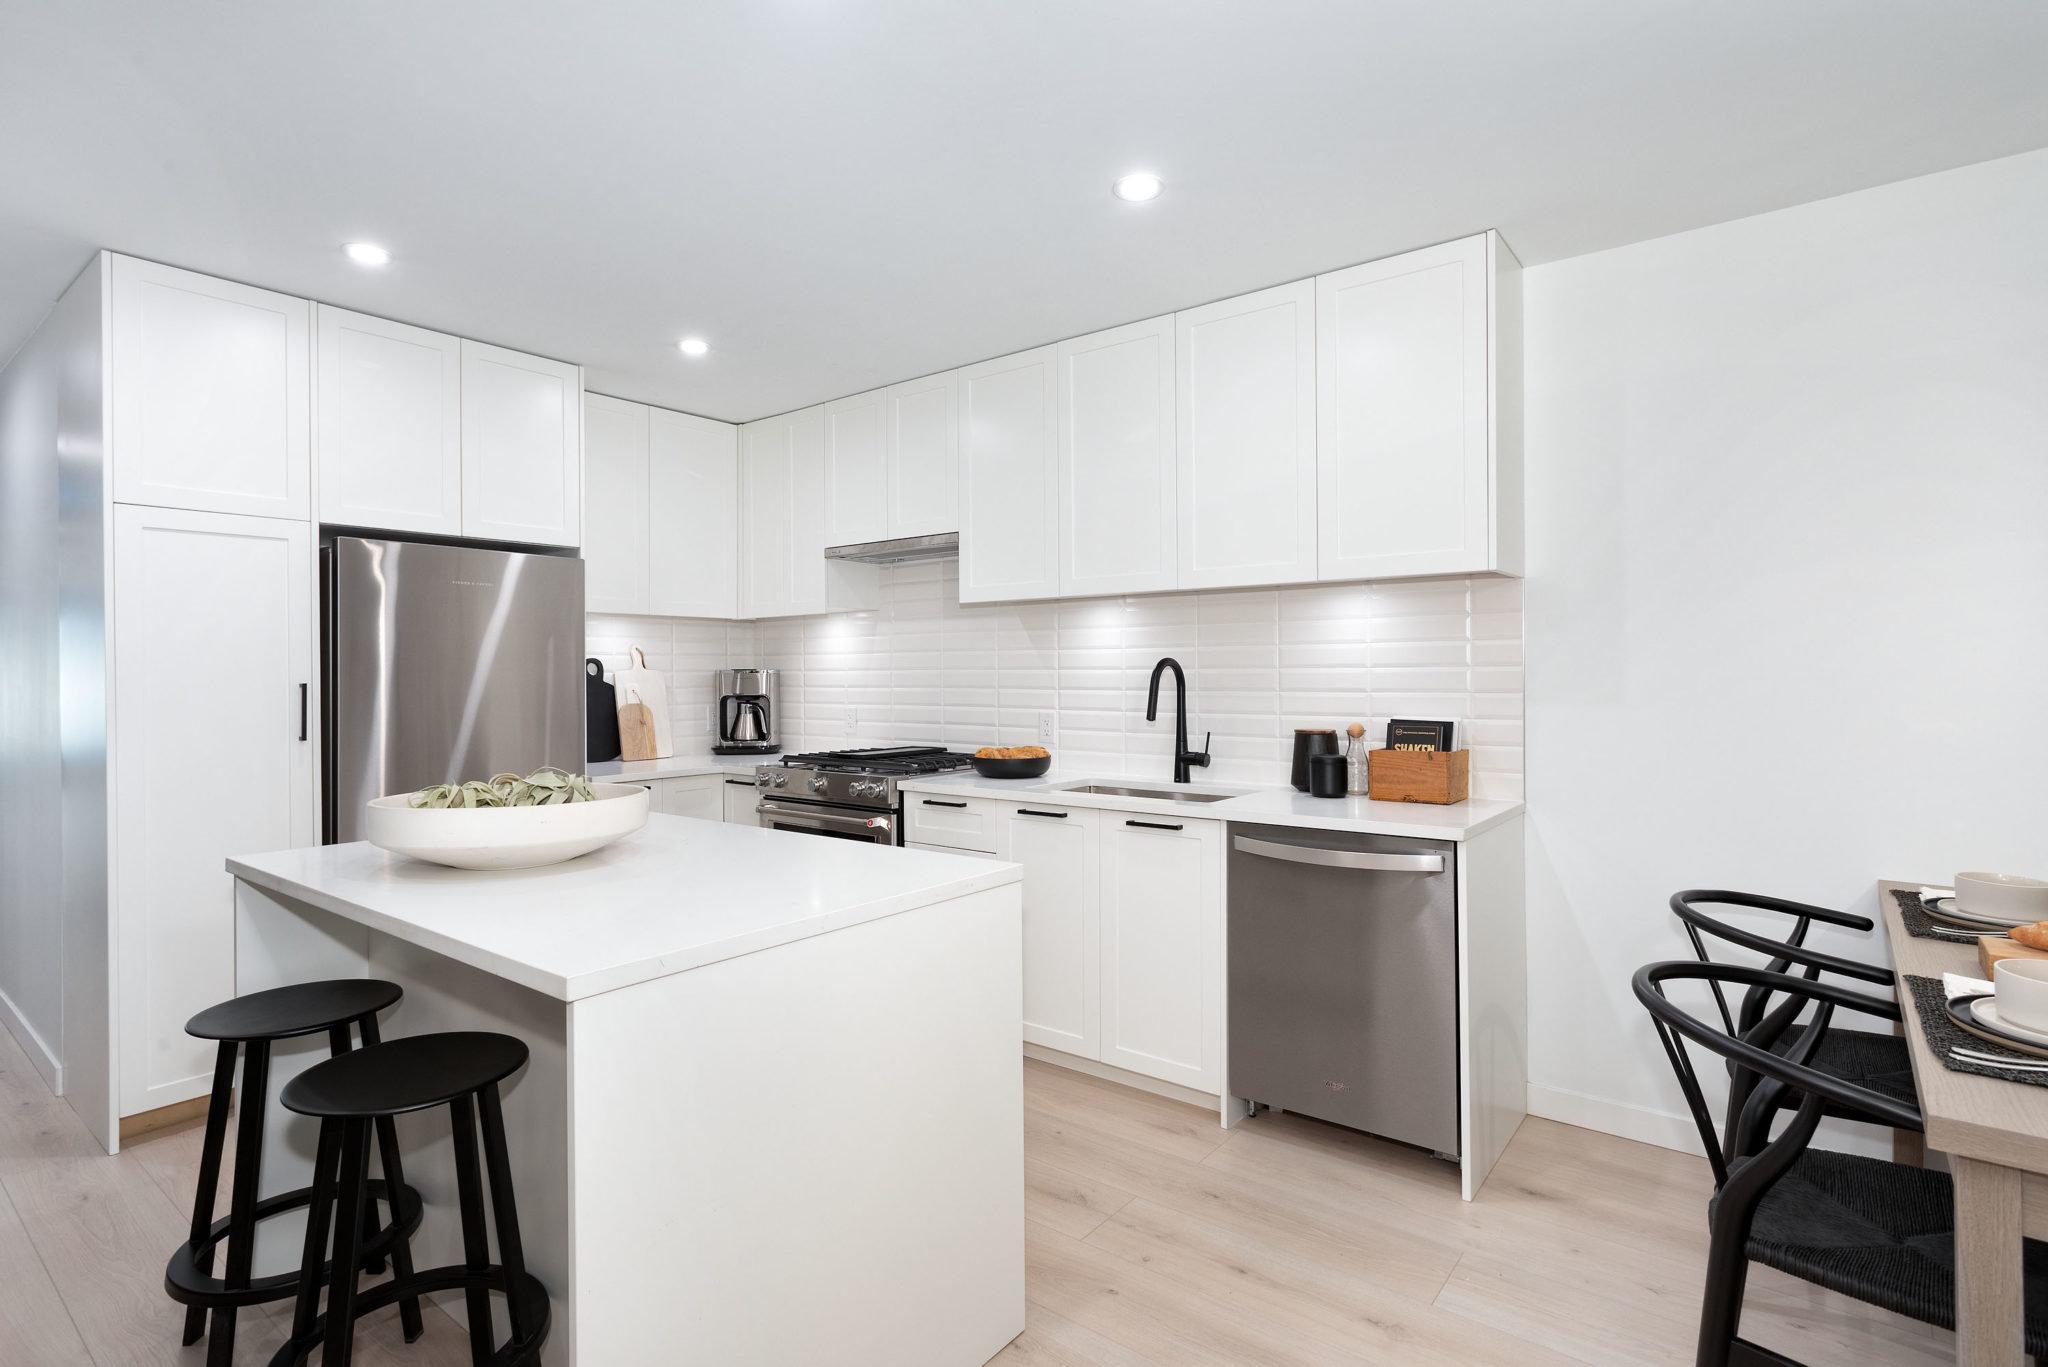 Kitchen Area - 5455 Brydon Cres, Langley, BC V3A 4A3, Canada!